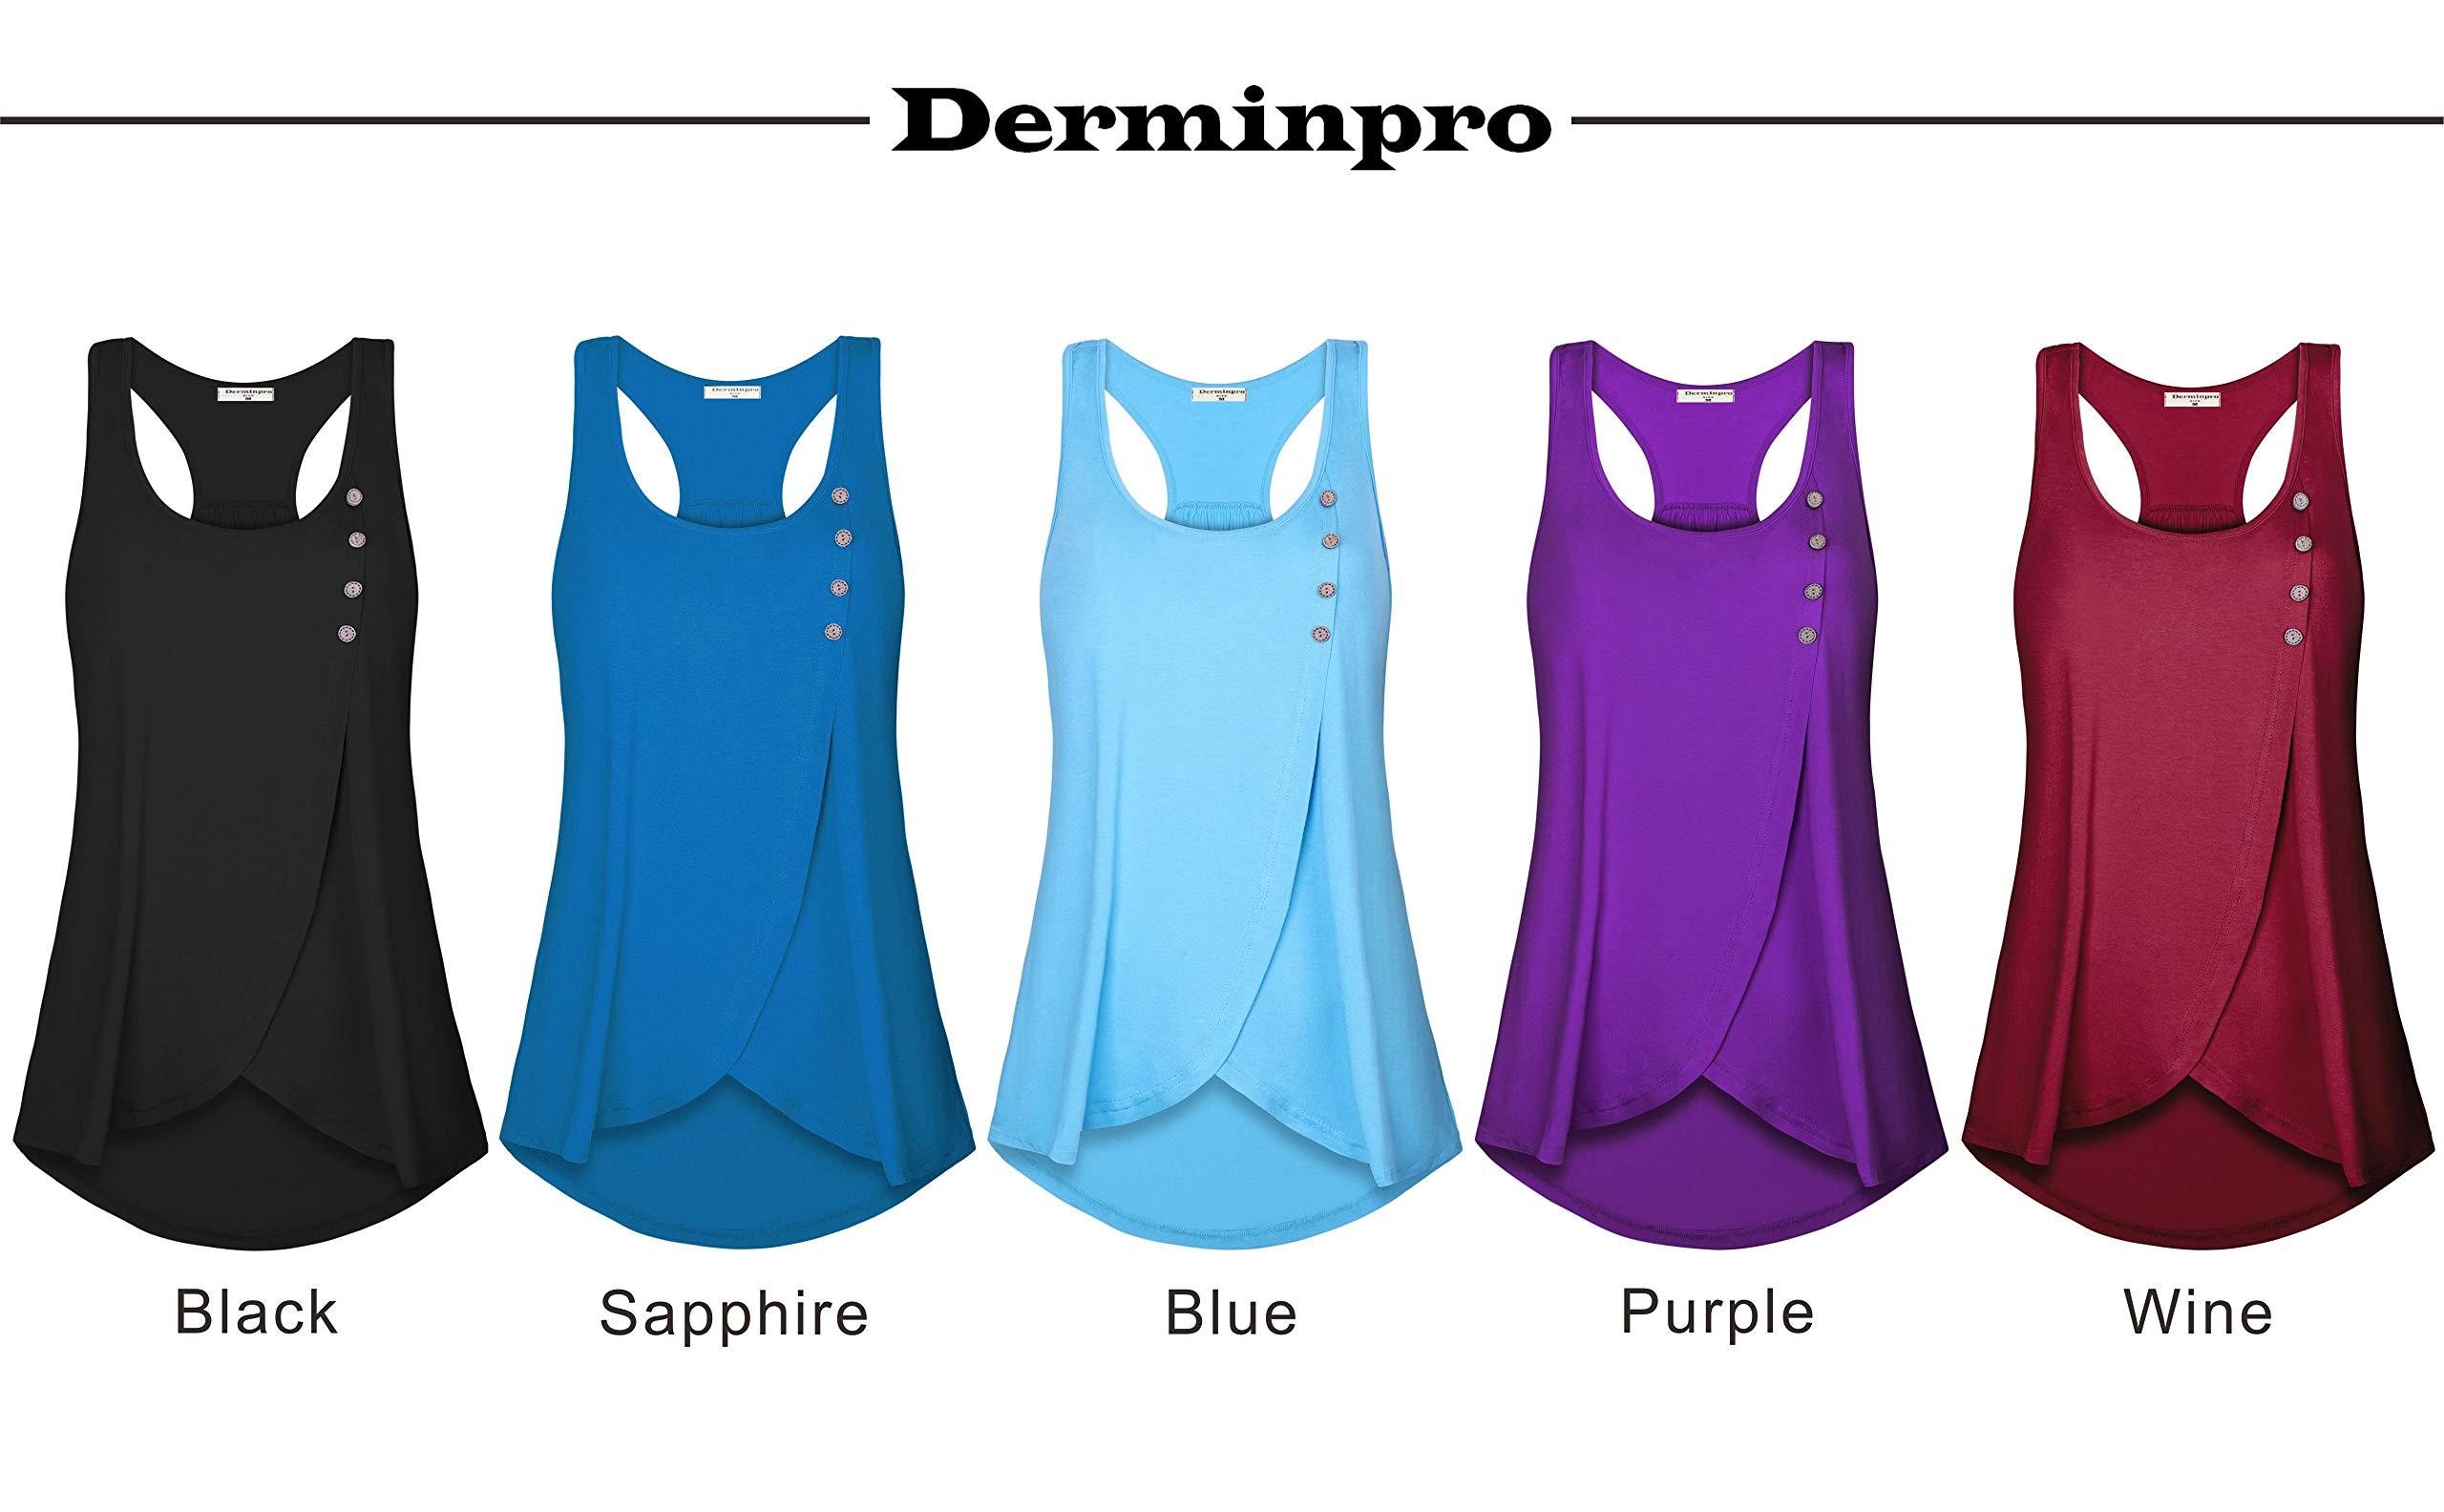 Derminpro Running Tank Tops for Women, Sleeveless Shirts Button Front A-Line Curve Hem Tunic Tops Black XX-Large